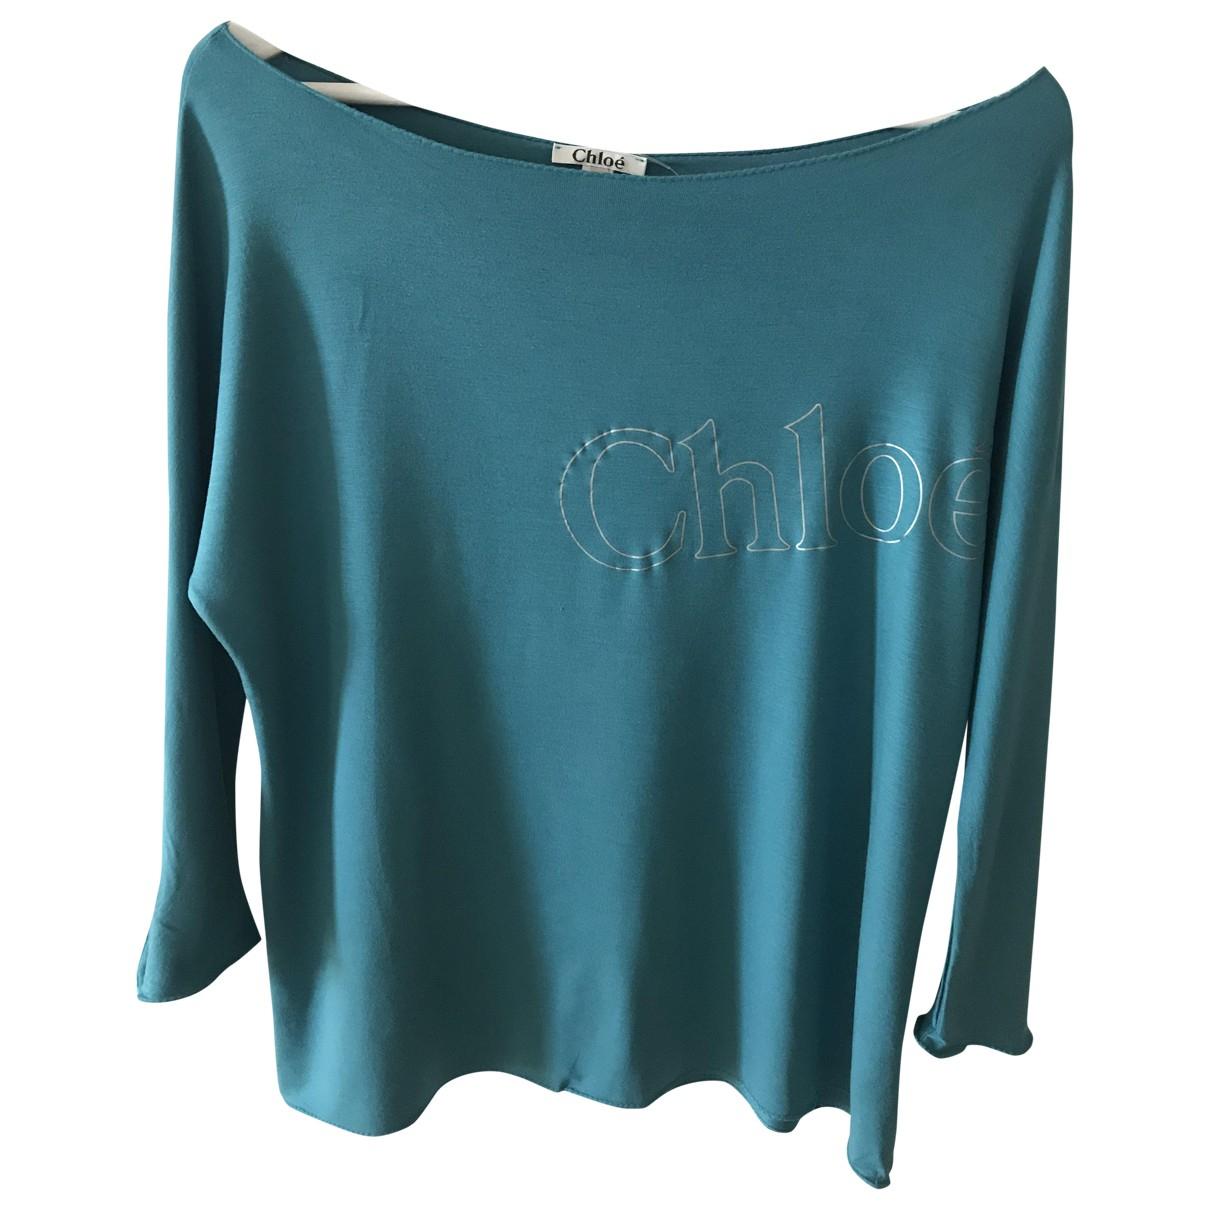 Chloé \N Blue  top for Women 38 FR